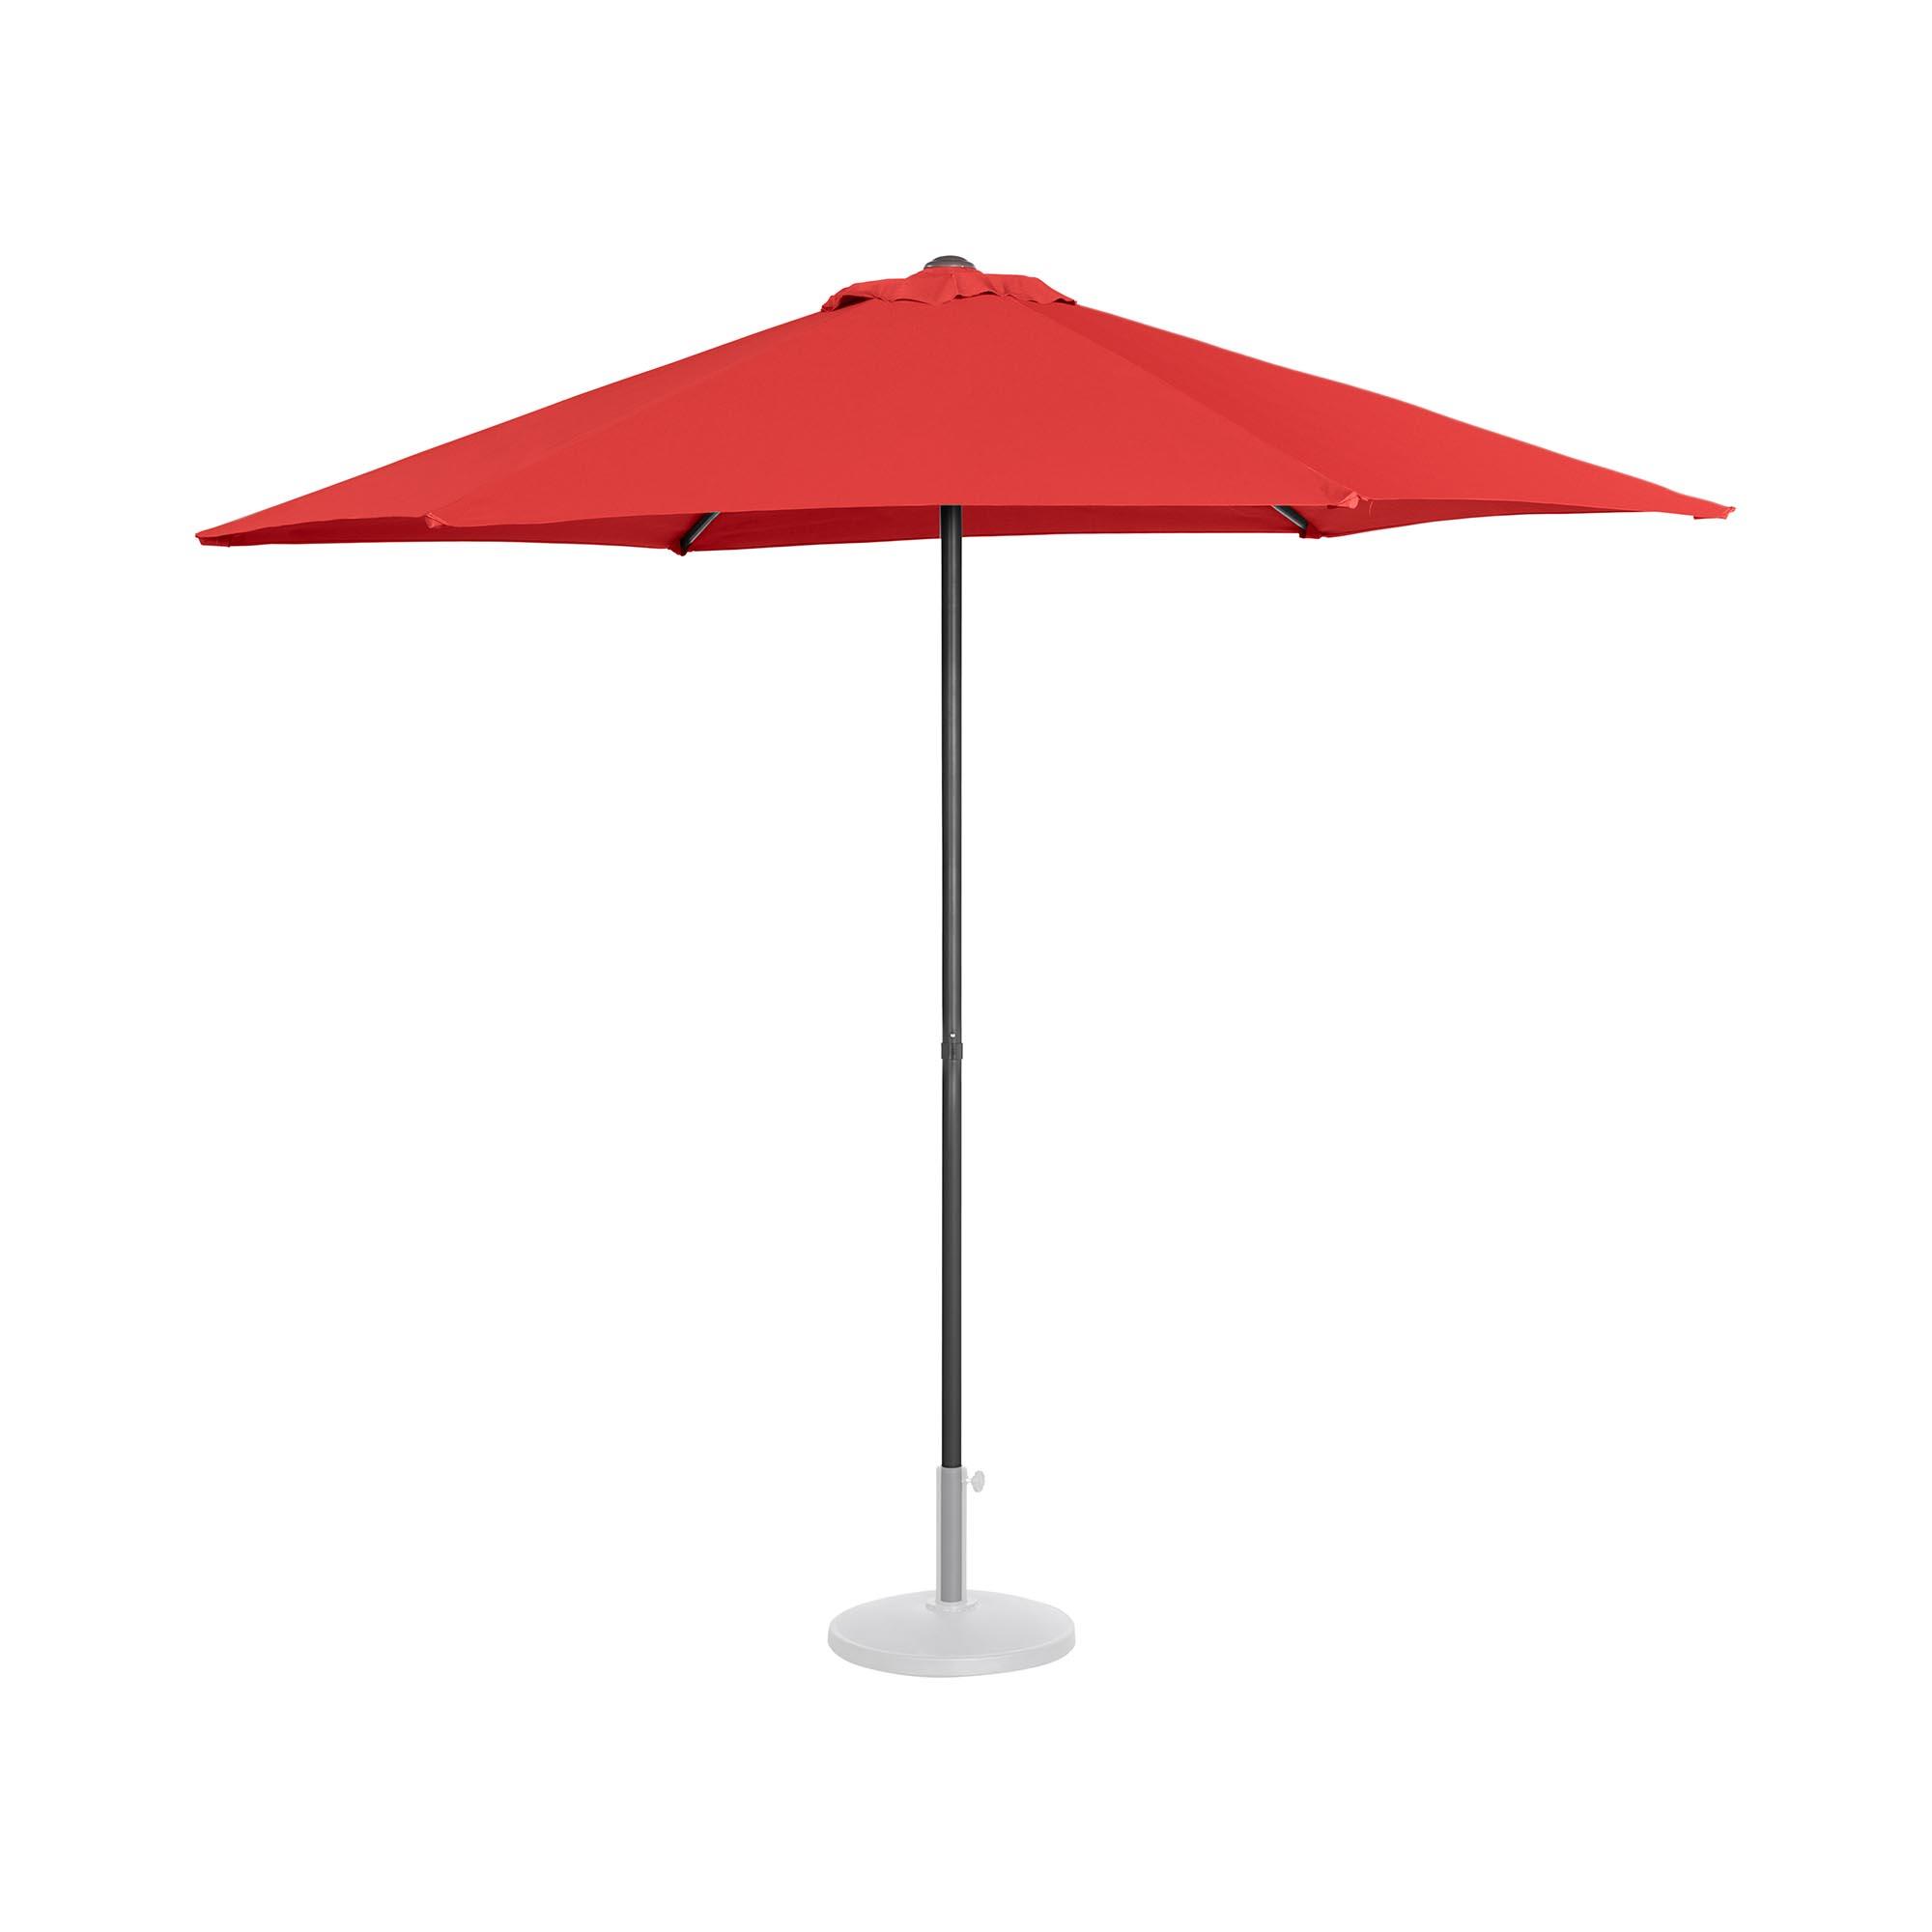 Uniprodo Sonnenschirm groß - rot - sechseckig - Ø 270 cm UNI_UMBRELLA_MR270RE